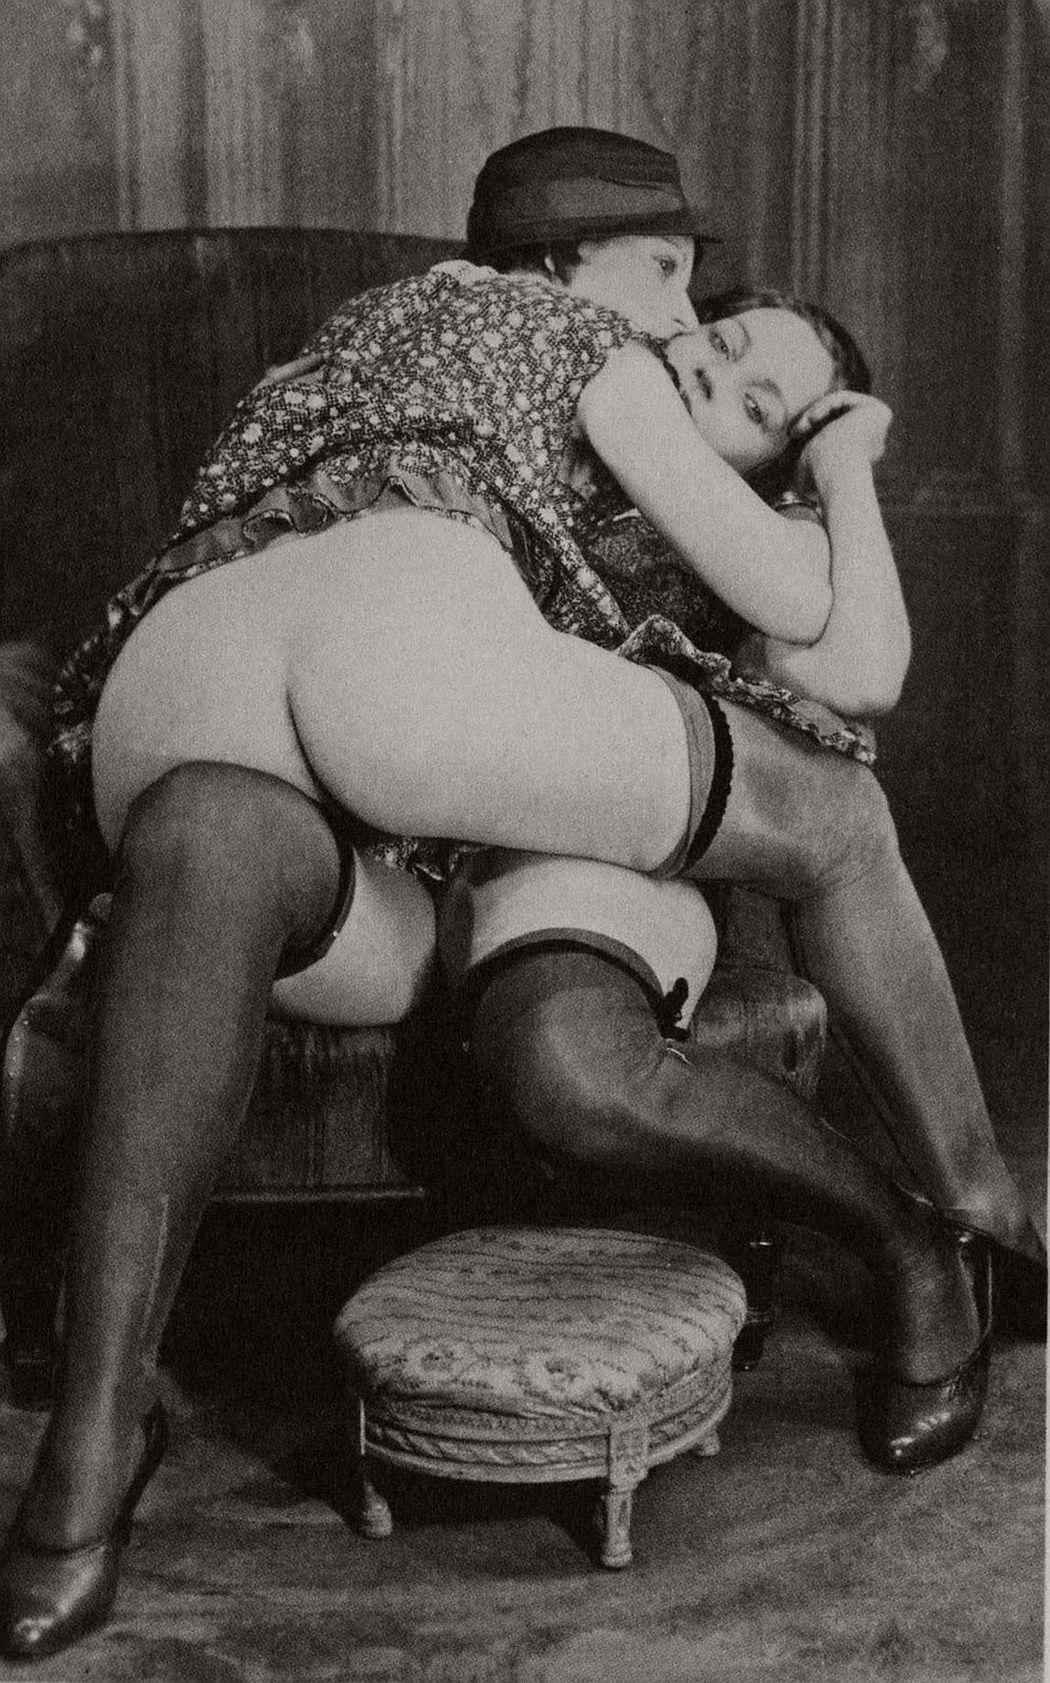 Vintage lesbian erotica